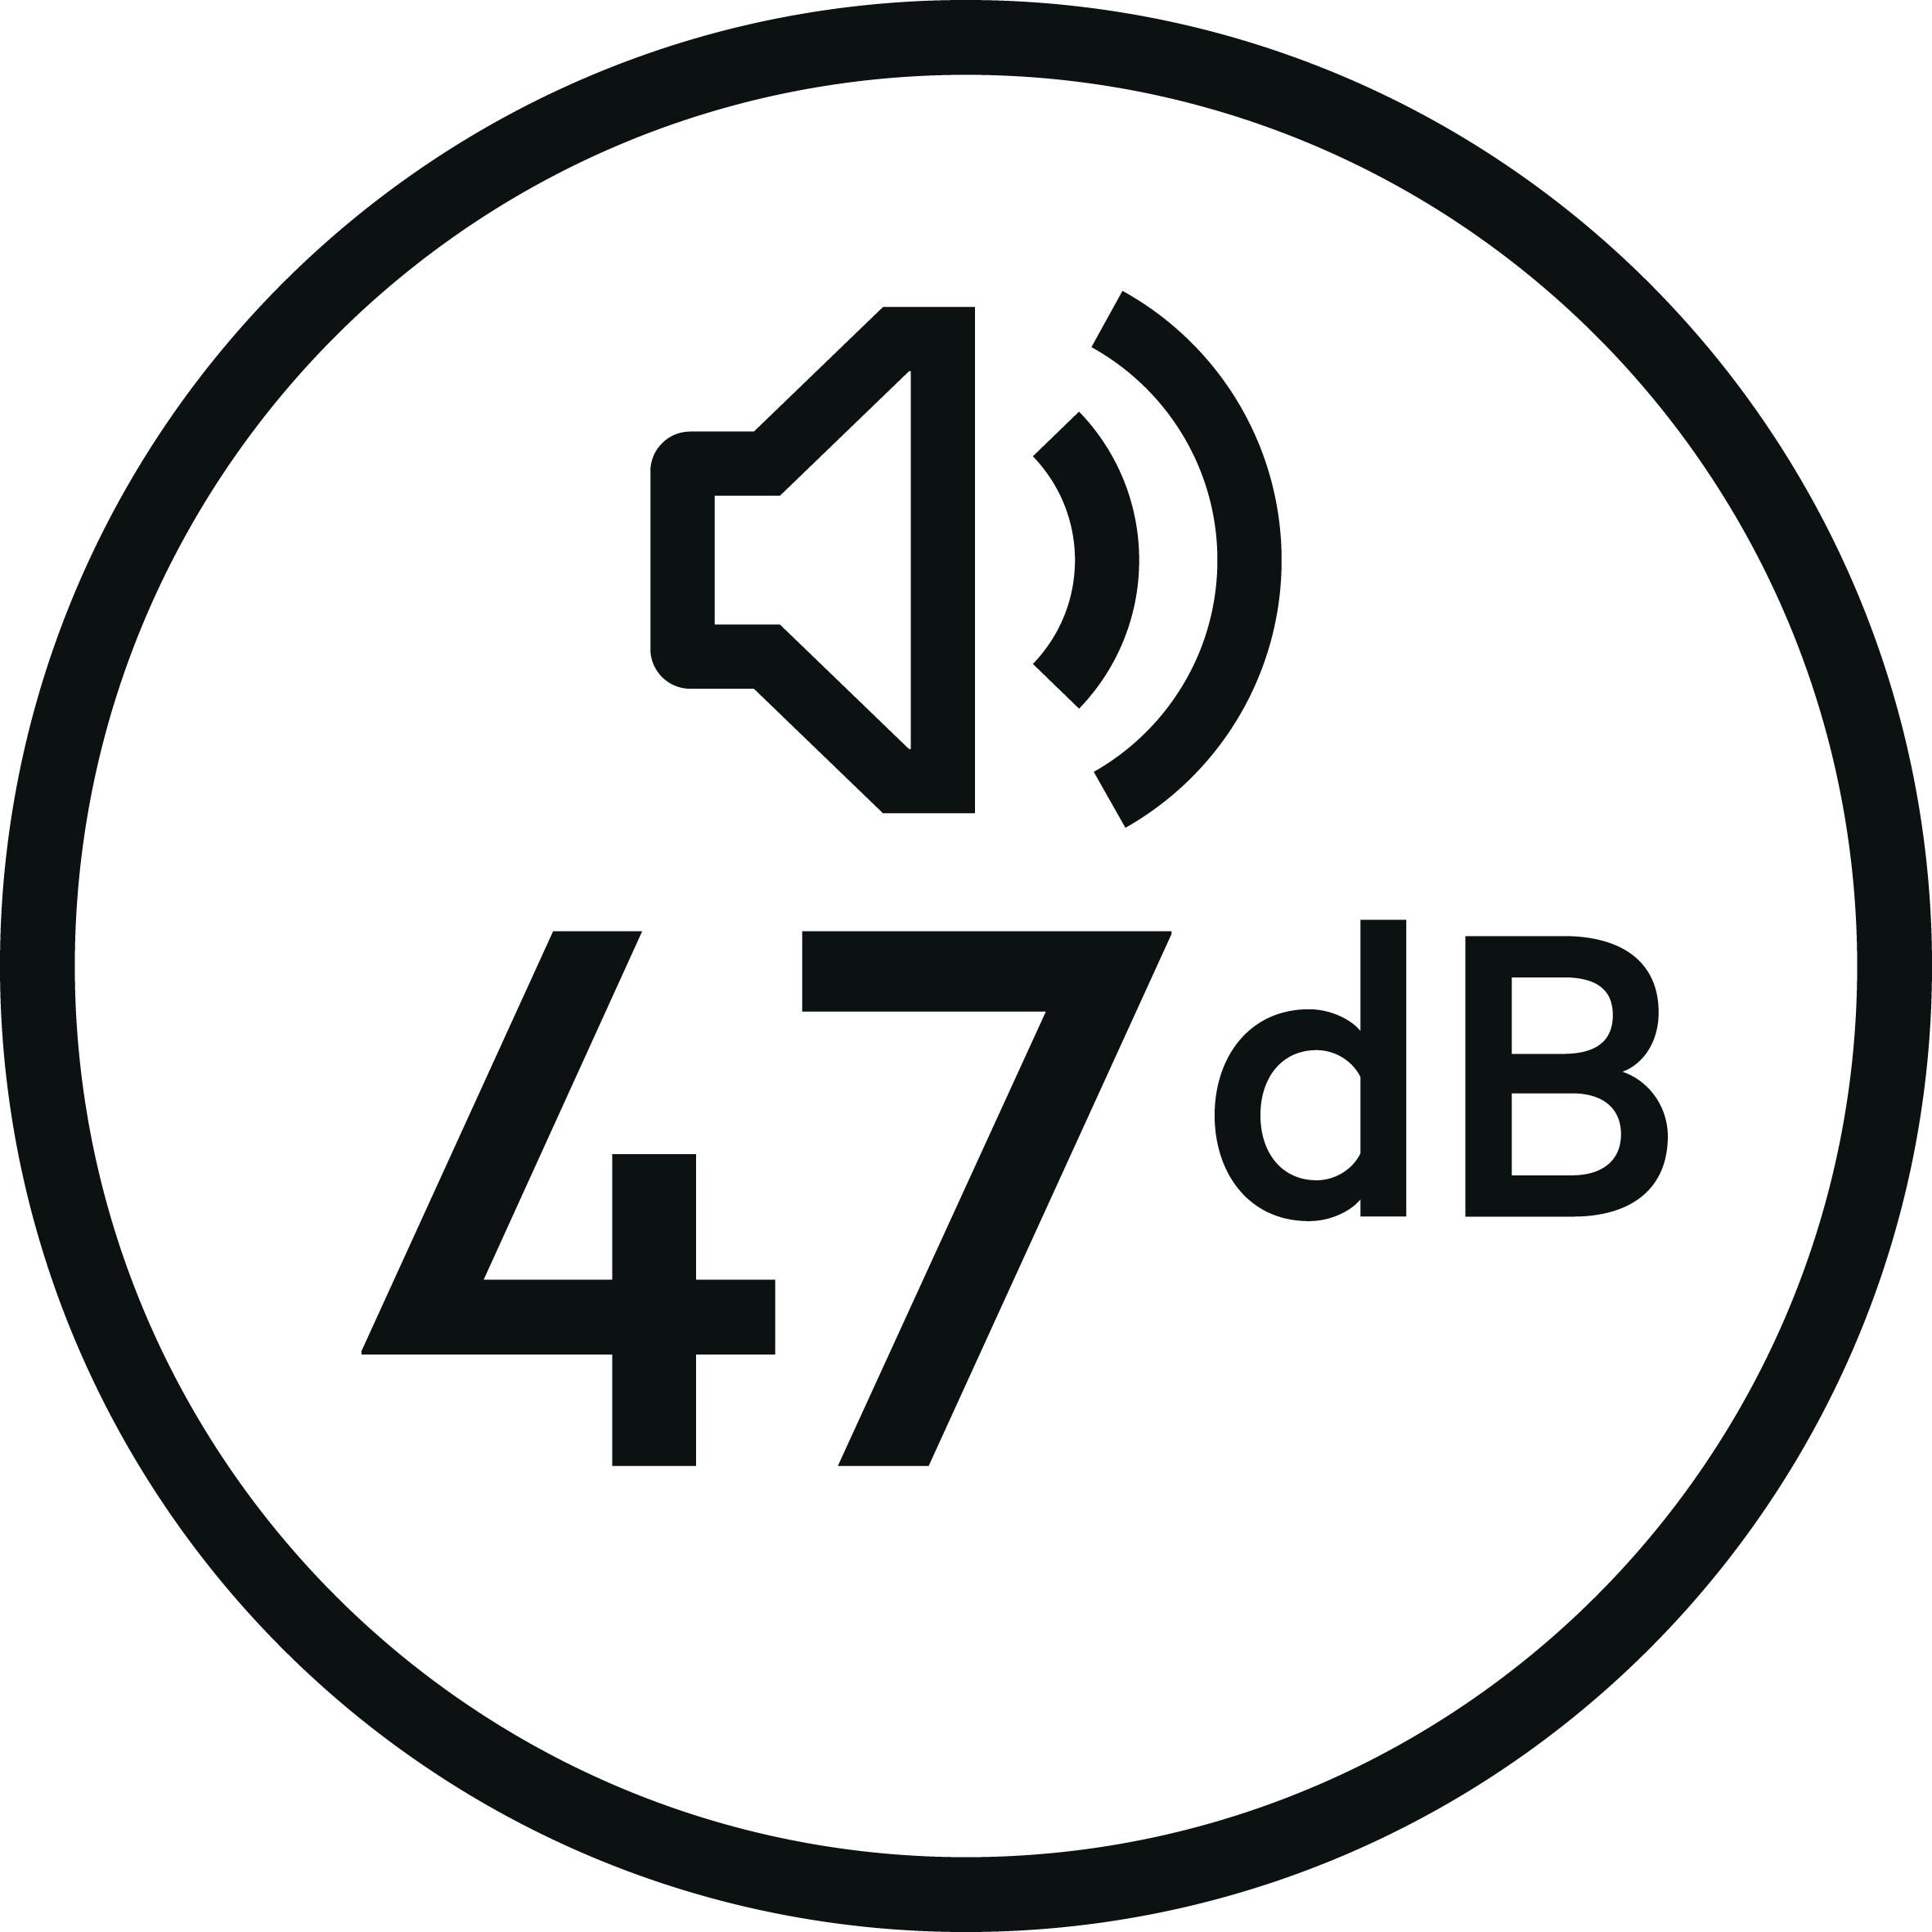 47dB-PSAAAP16PC569044.jpg